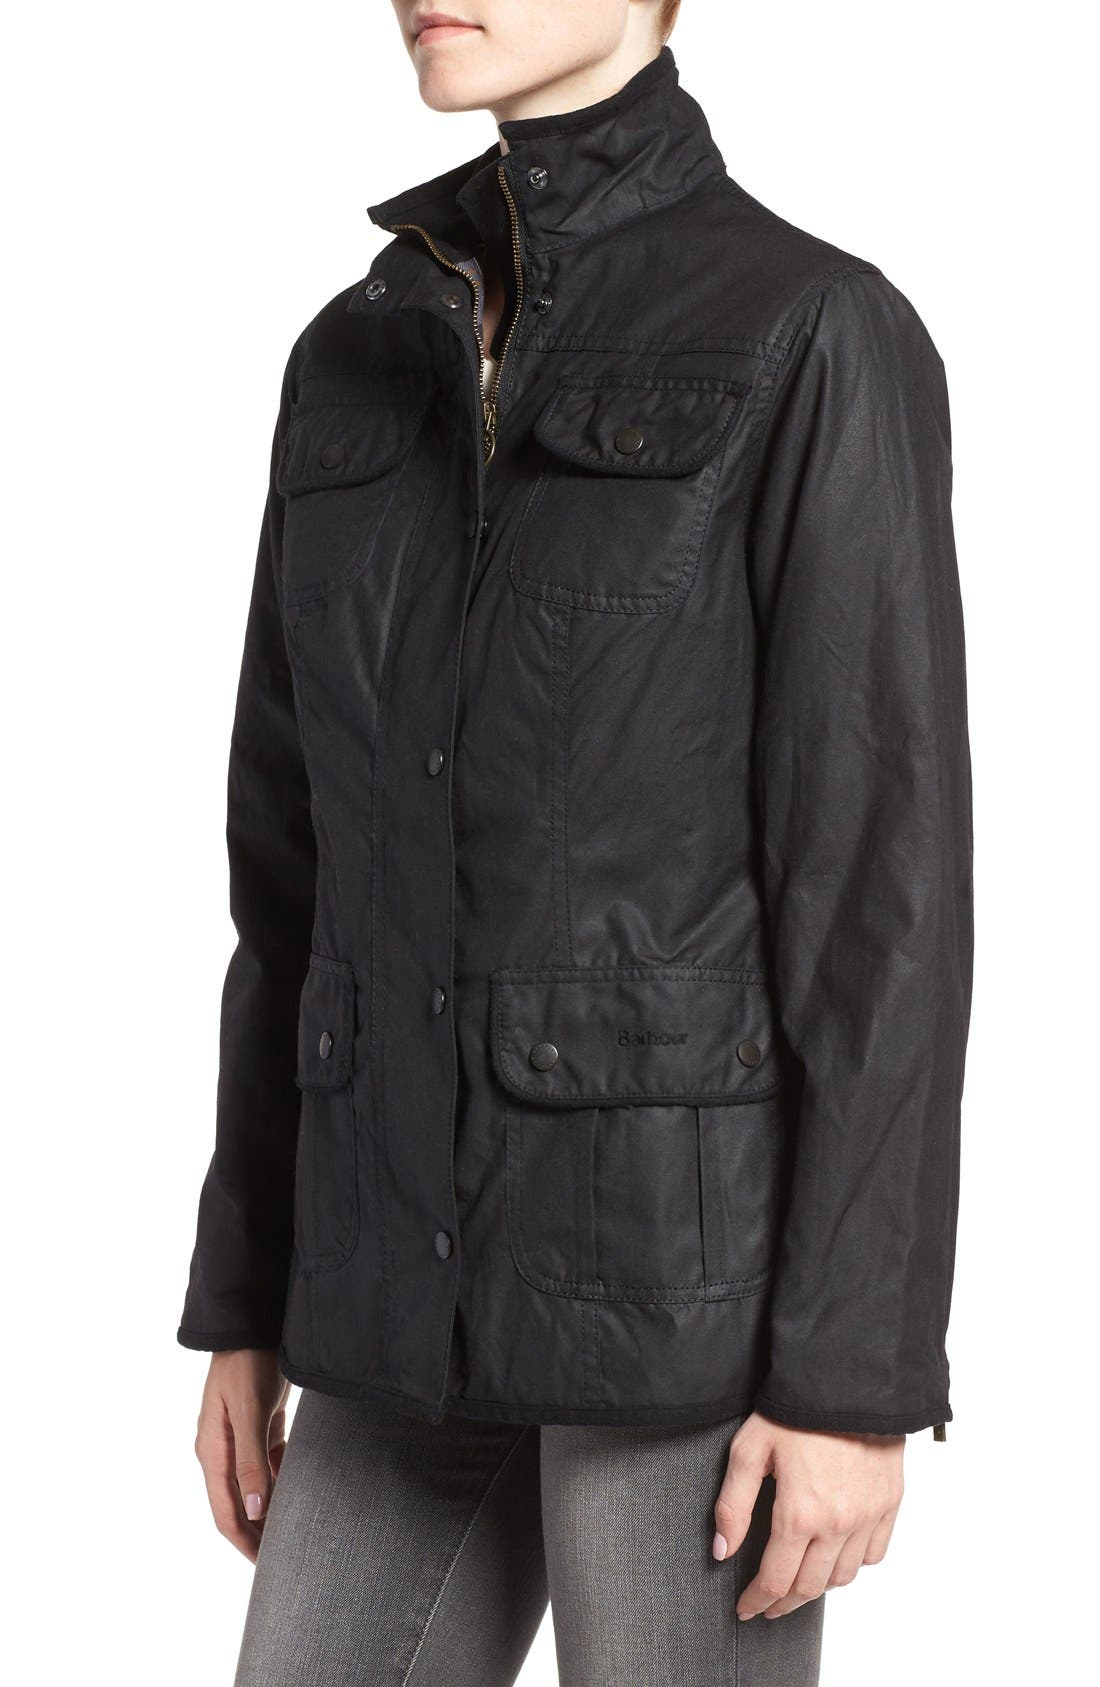 Alternate Image 3  - Barbour Waxed Cotton Utility Jacket